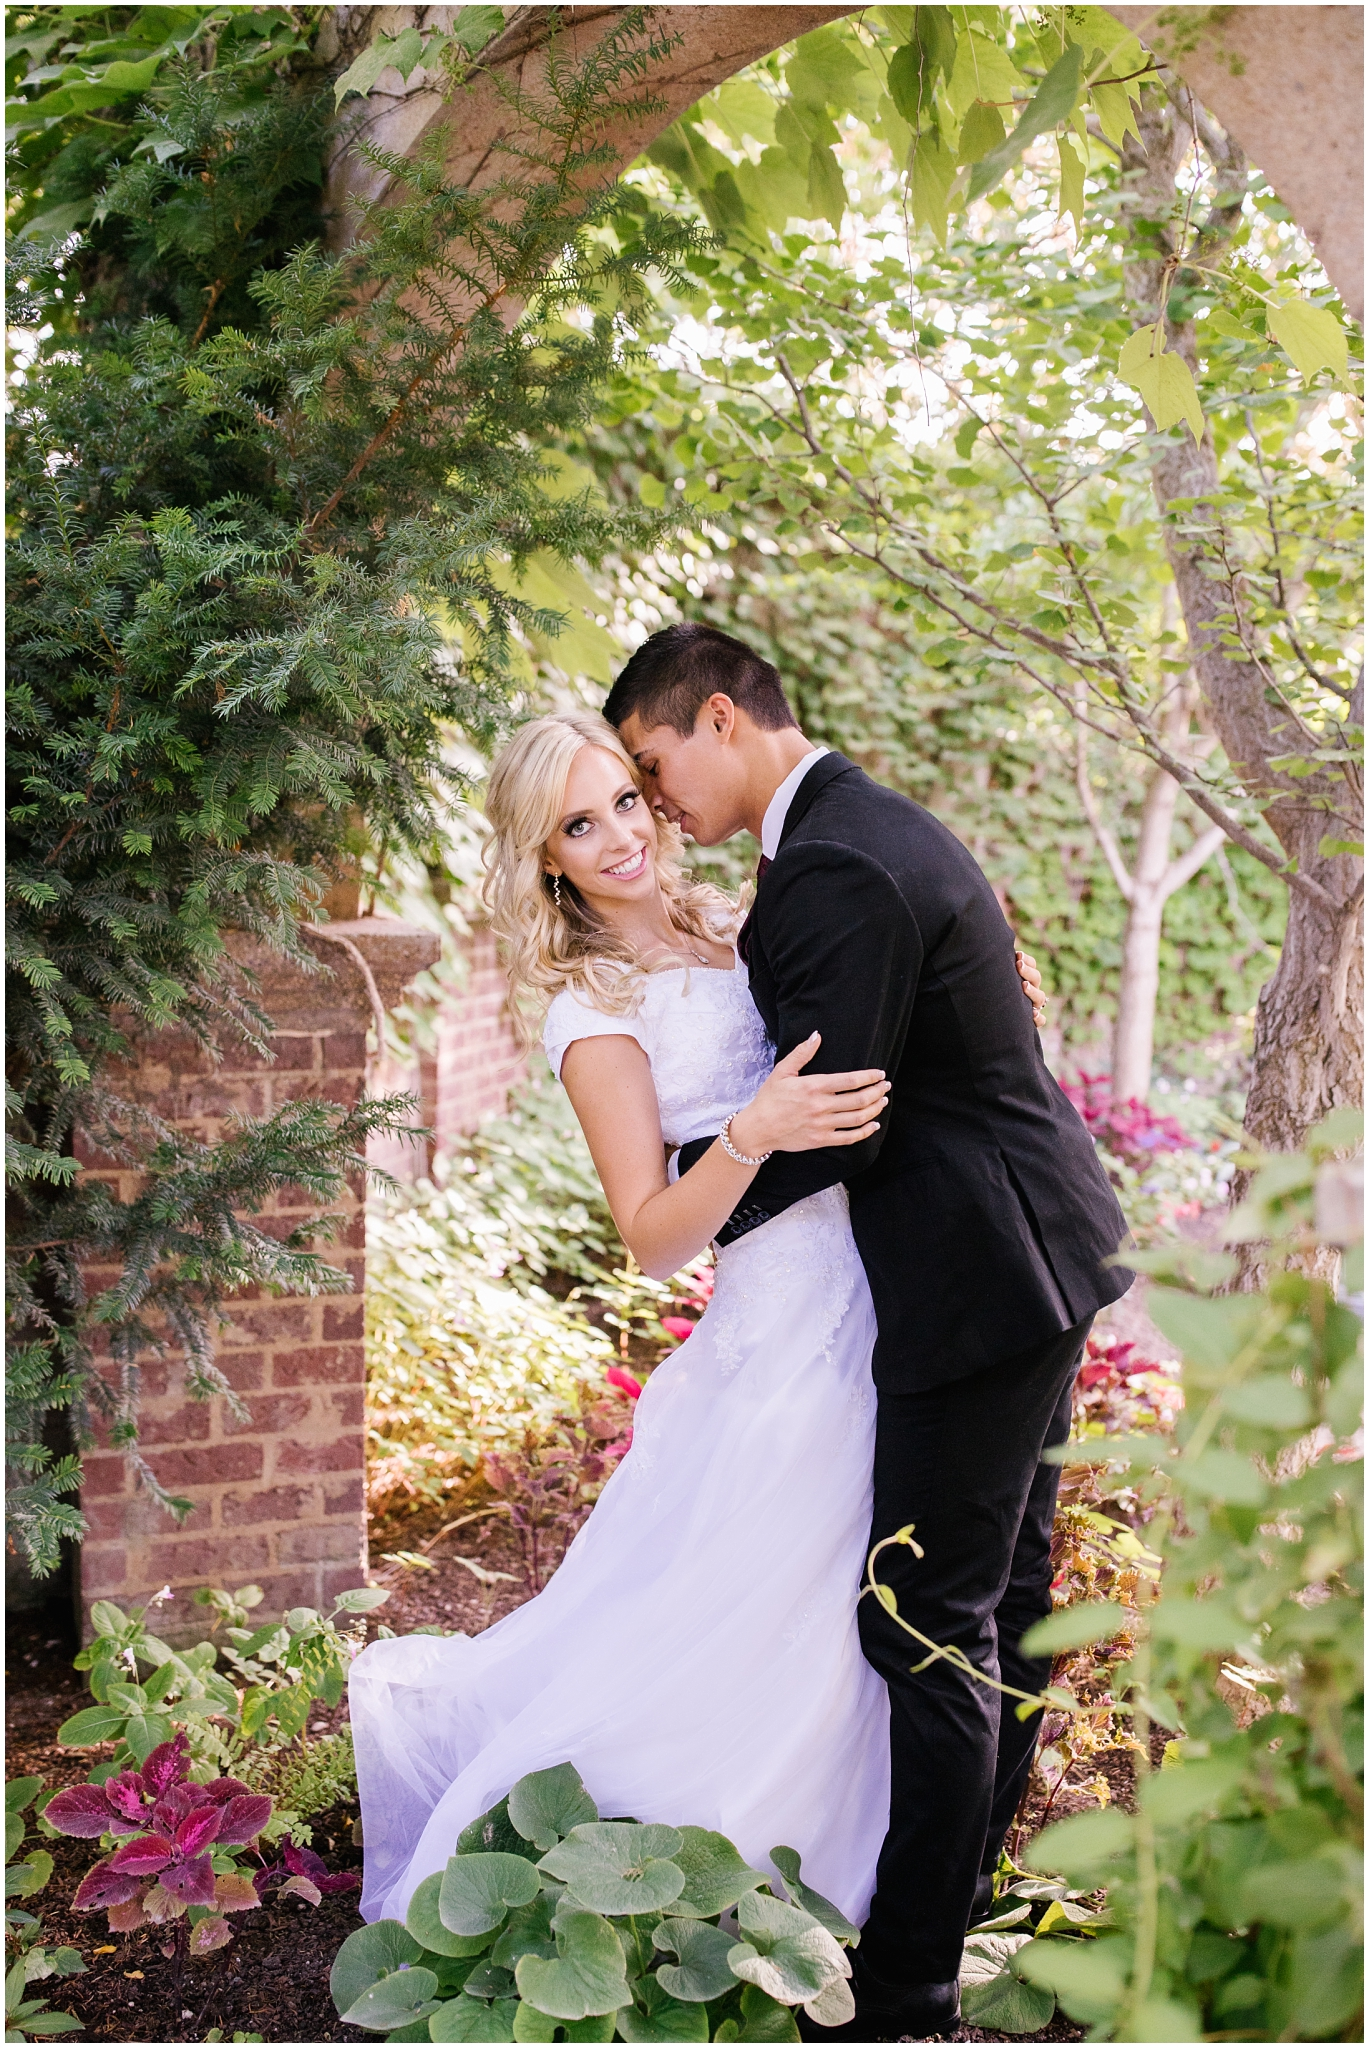 CHBridals-25_Lizzie-B-Imagery-Utah-Wedding-Photographer-Salt-Lake-City-Park-City-Thanksgiving-Point-Ashton-Gardens.jpg